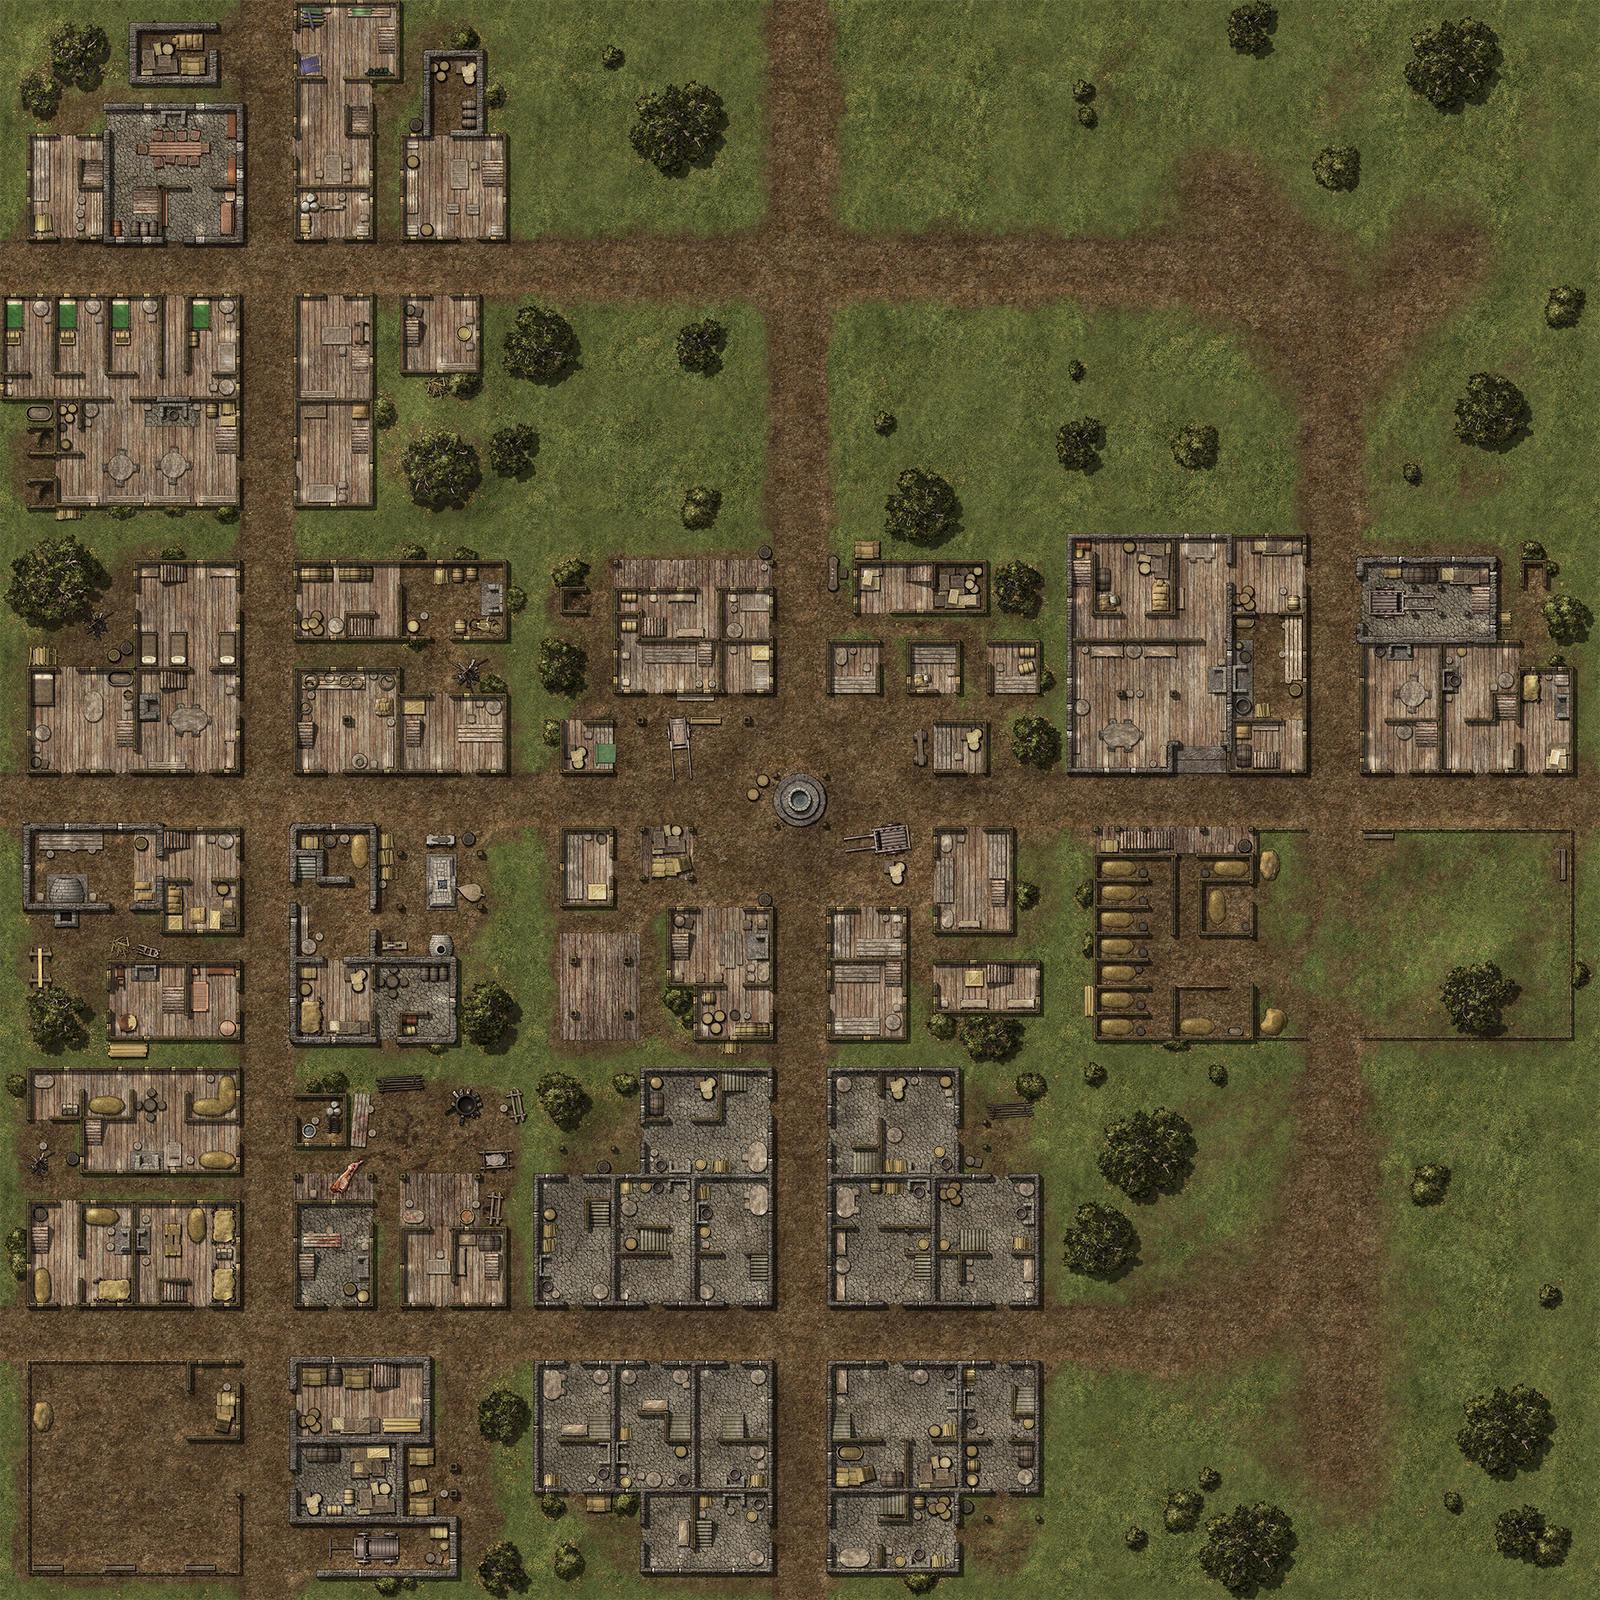 City Street Map Pathfinder